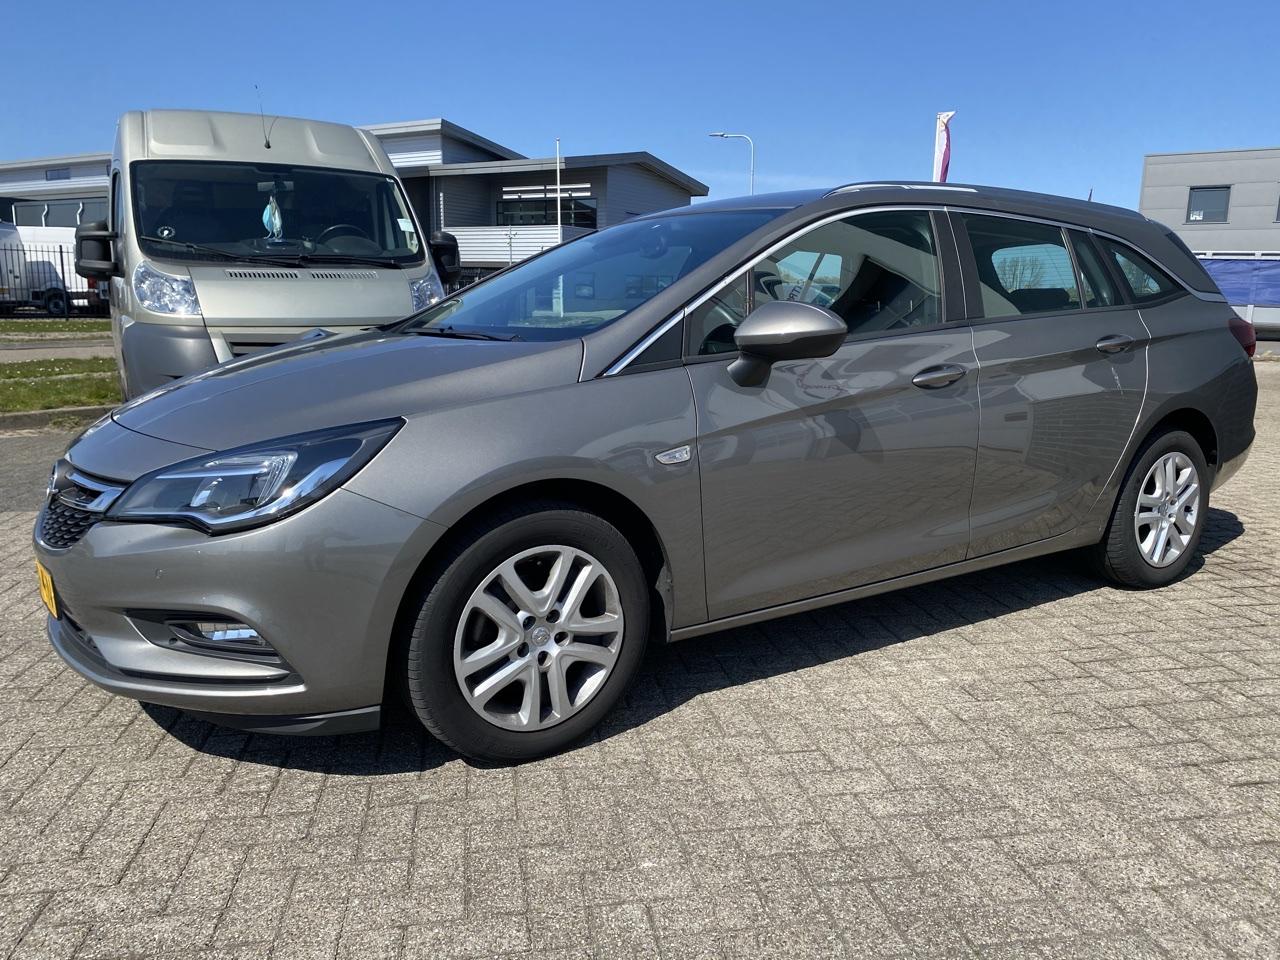 Opel Astra 1.0 turbo 105pk start/stop edition